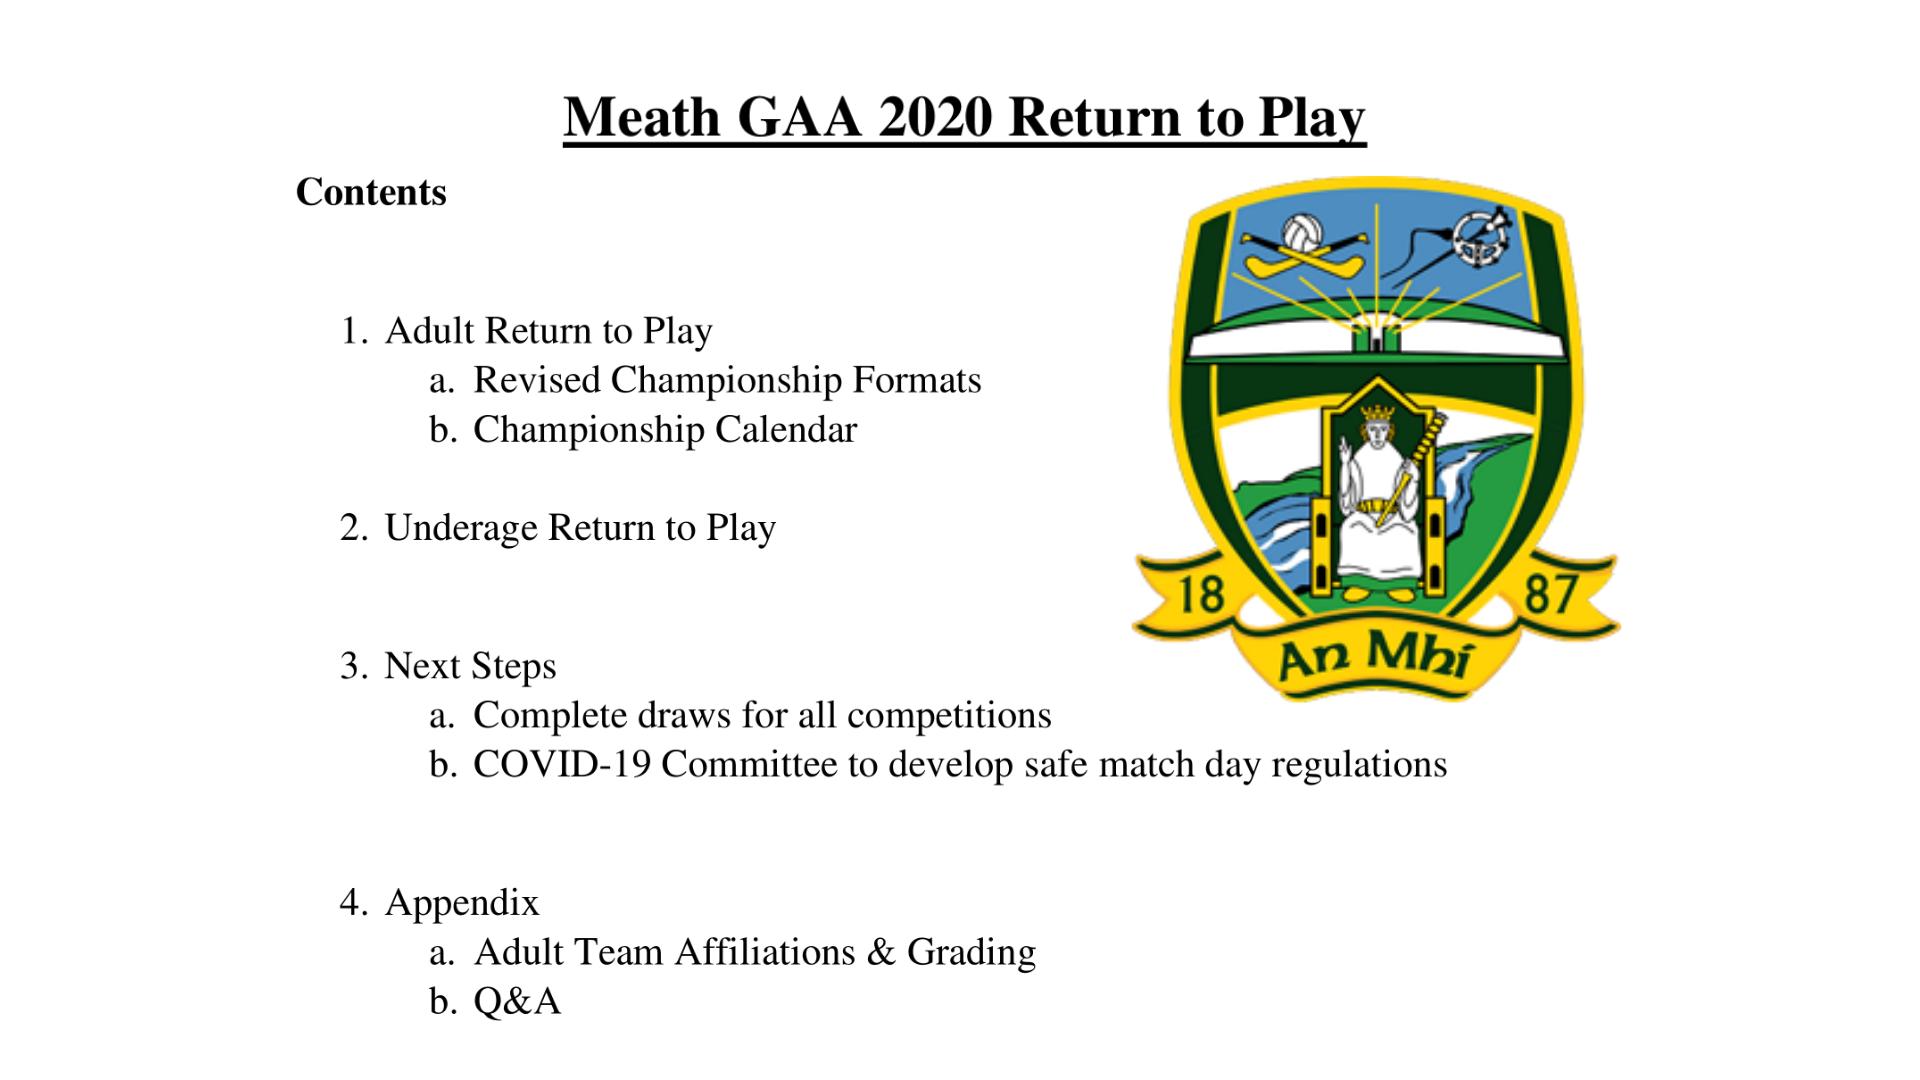 2020 Meath GAA Return to Play (11-06-20)